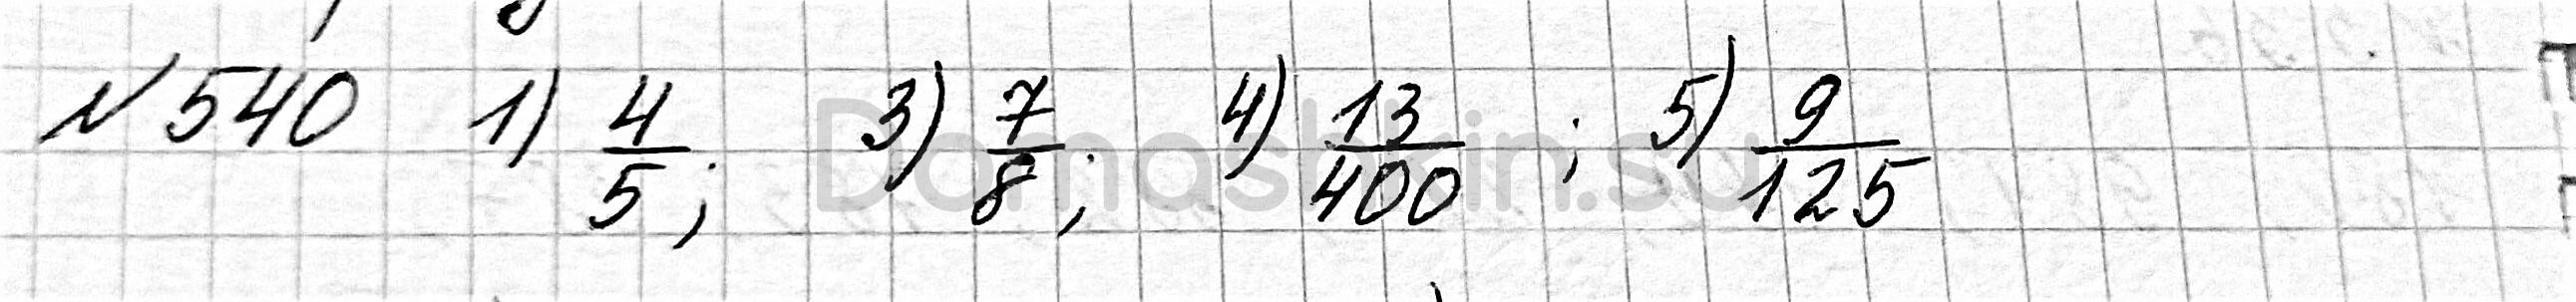 Математика 6 класс учебник Мерзляк номер 540 решение